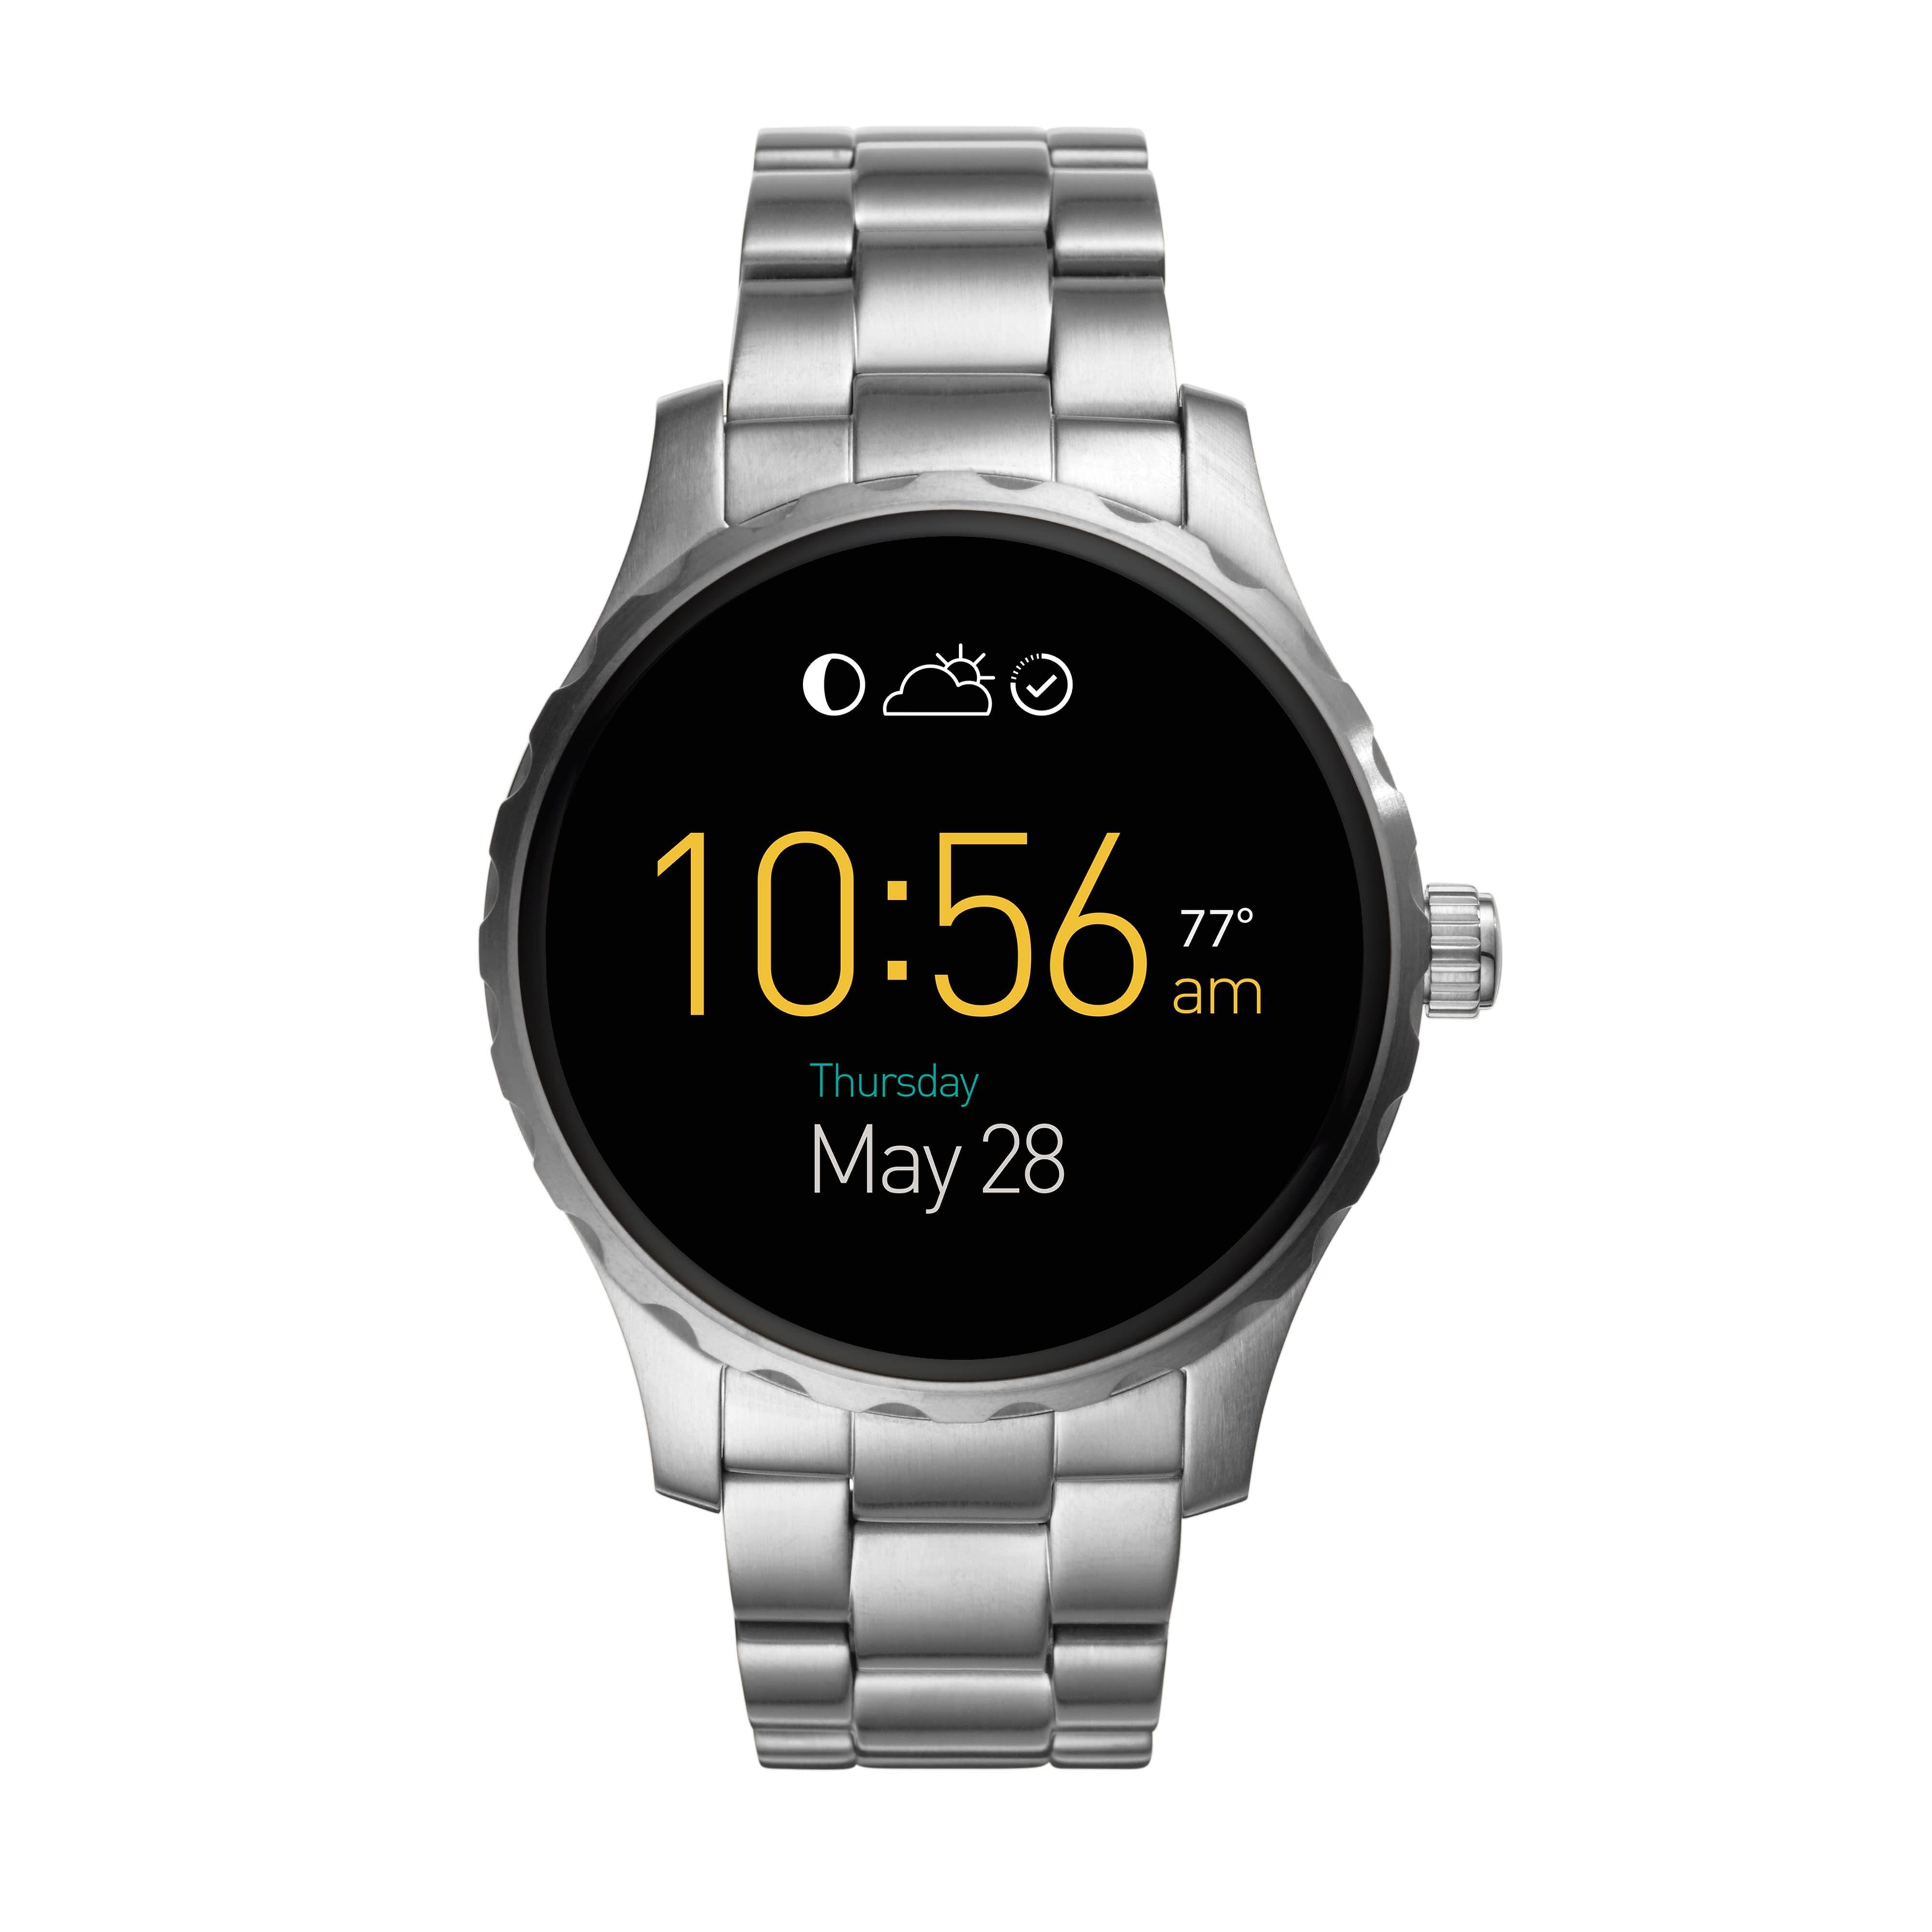 b62ea6a8c169e Relógio Fossil   Relógio Smartwatch Fossil Q FTW2109 1CI